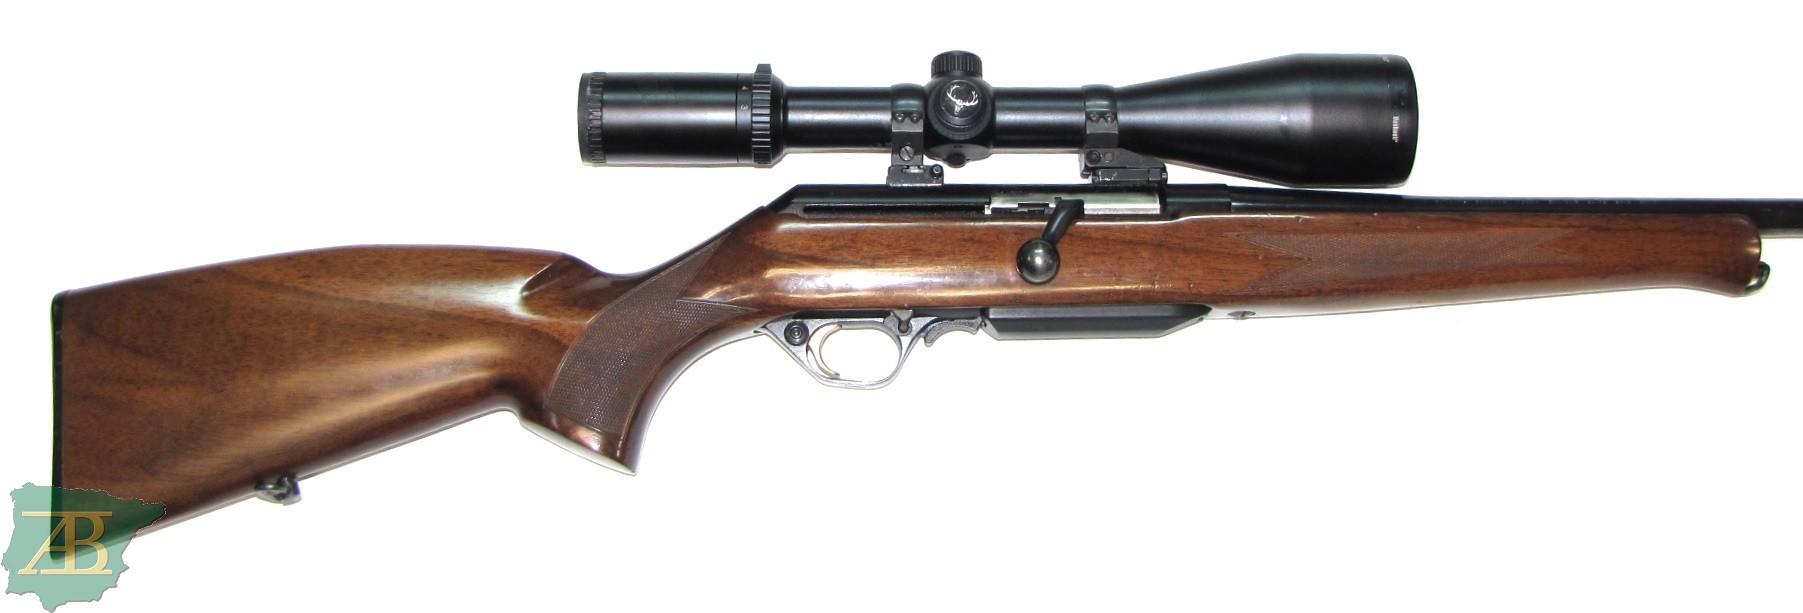 Rifle de cerrojo de caza BROWNING Ref 5803-armeriaiberica-2